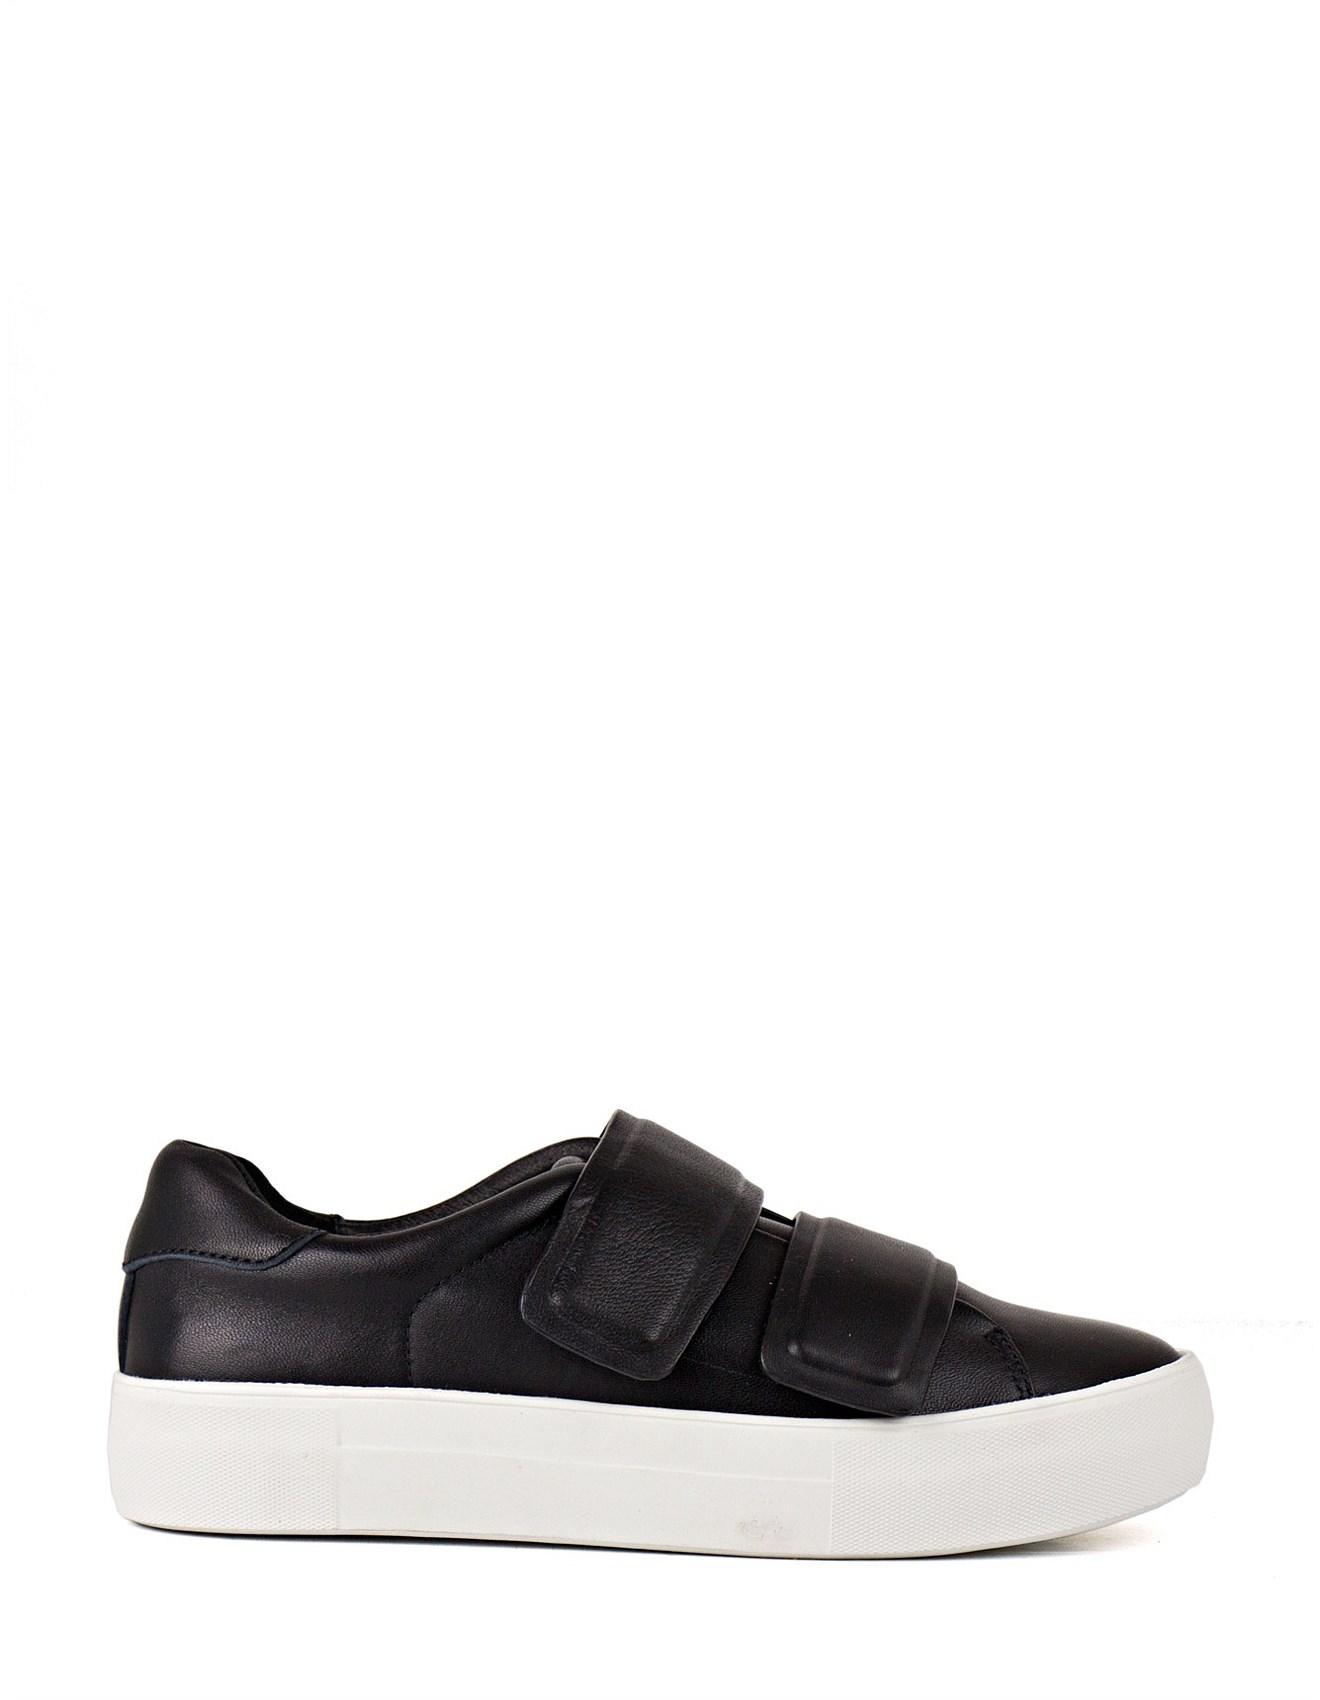 Adelynn Velco Sneaker Edward Meller 2zAZ6sWMc